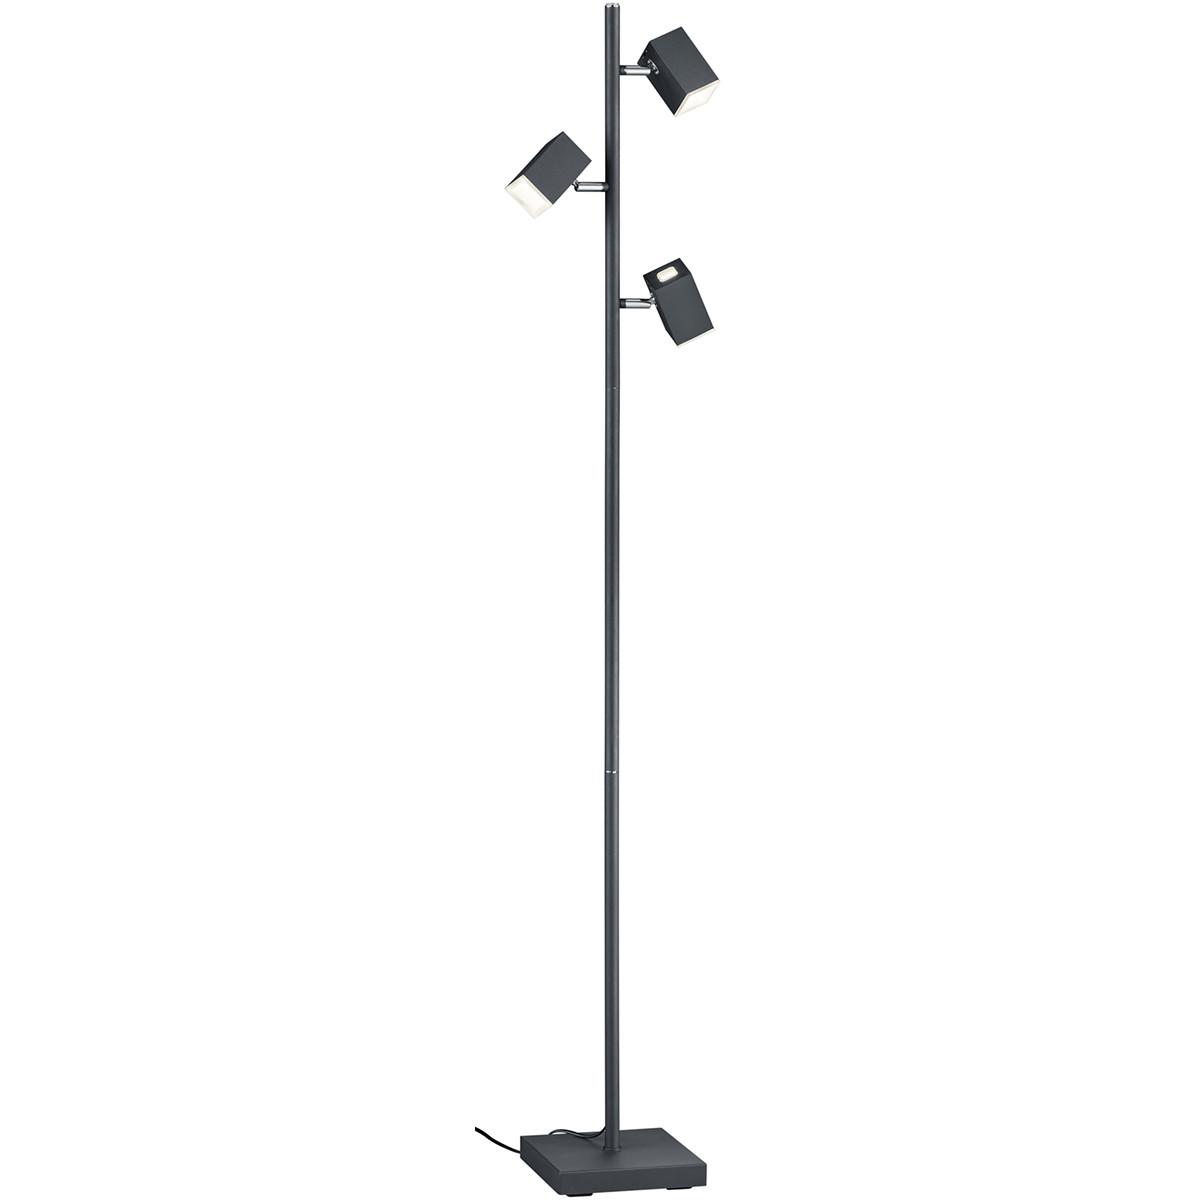 LED Vloerlamp - Trion Laginos - 12W - Warm Wit 3000K - 3-lichts - Dimbaar - Rond - Mat Zwart - Alumi